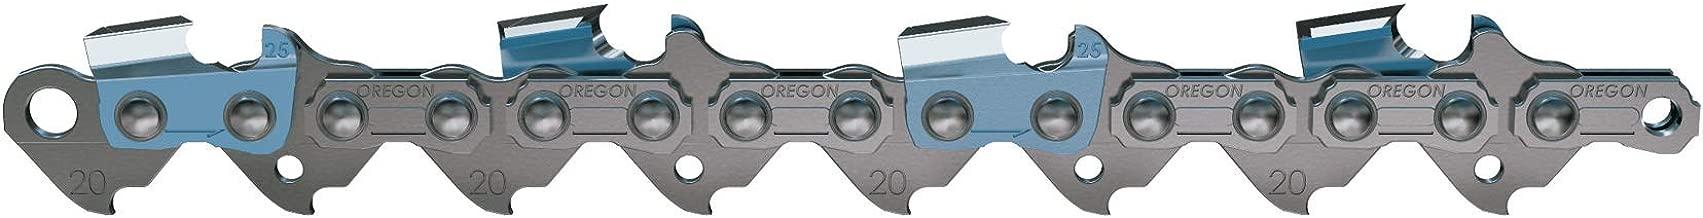 OREGON 20LPX074G 74 Drive Link Super 20 Chain, 0.325-Inch